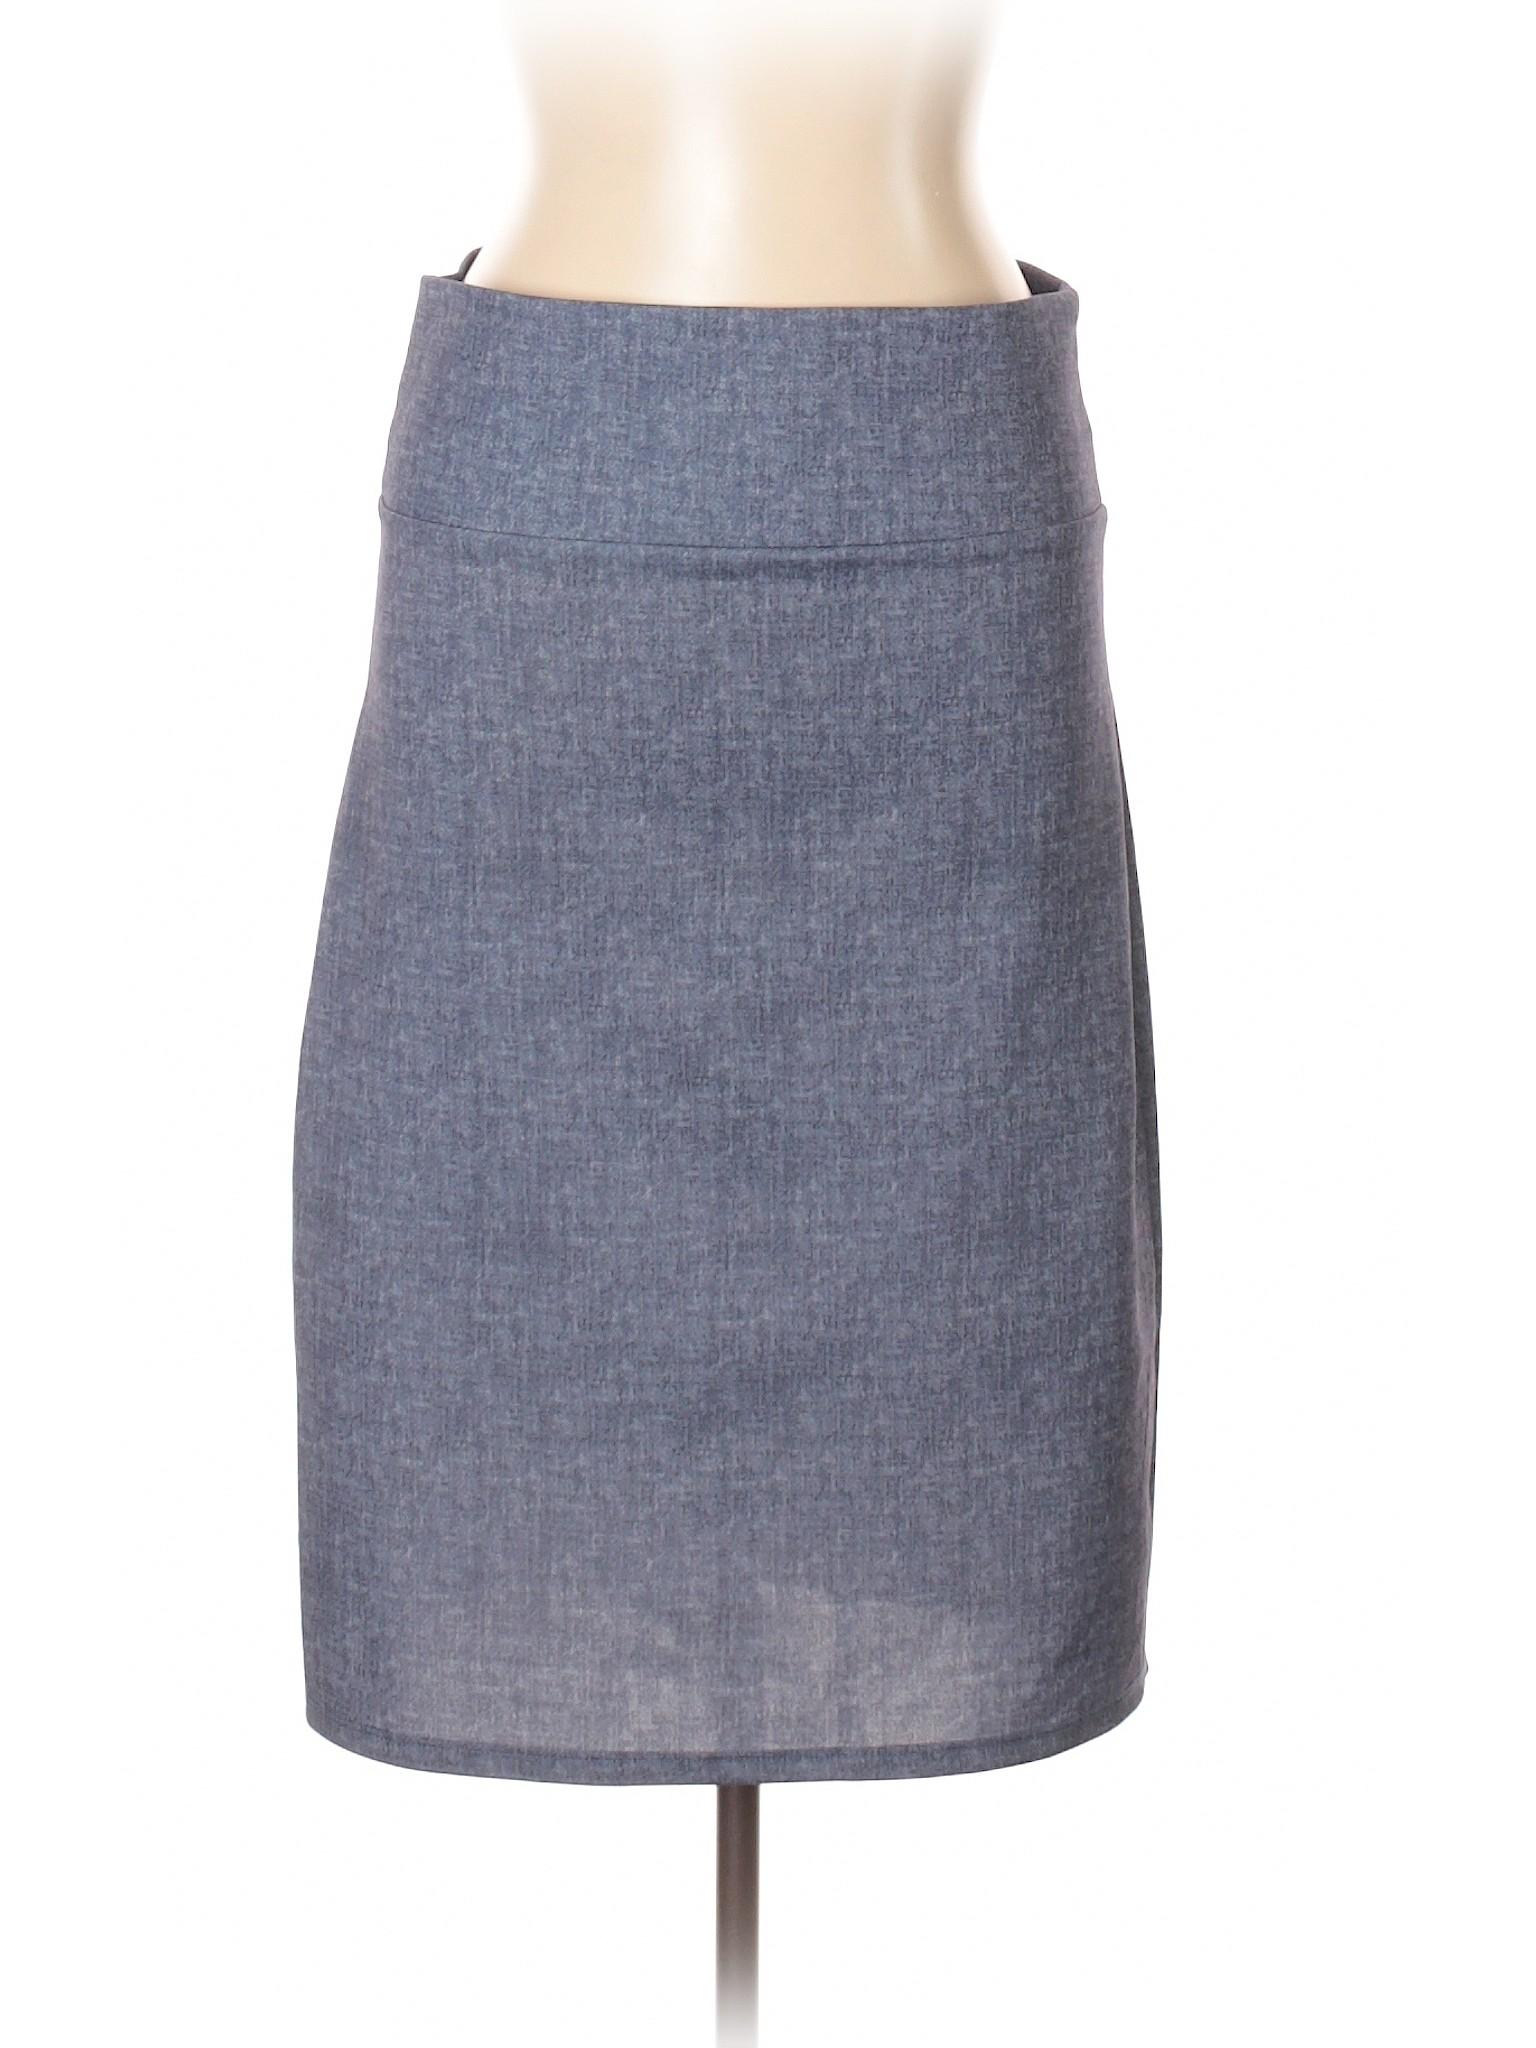 Casual Boutique Boutique Boutique Skirt Boutique Skirt Skirt Casual Casual Bvxpwzntz